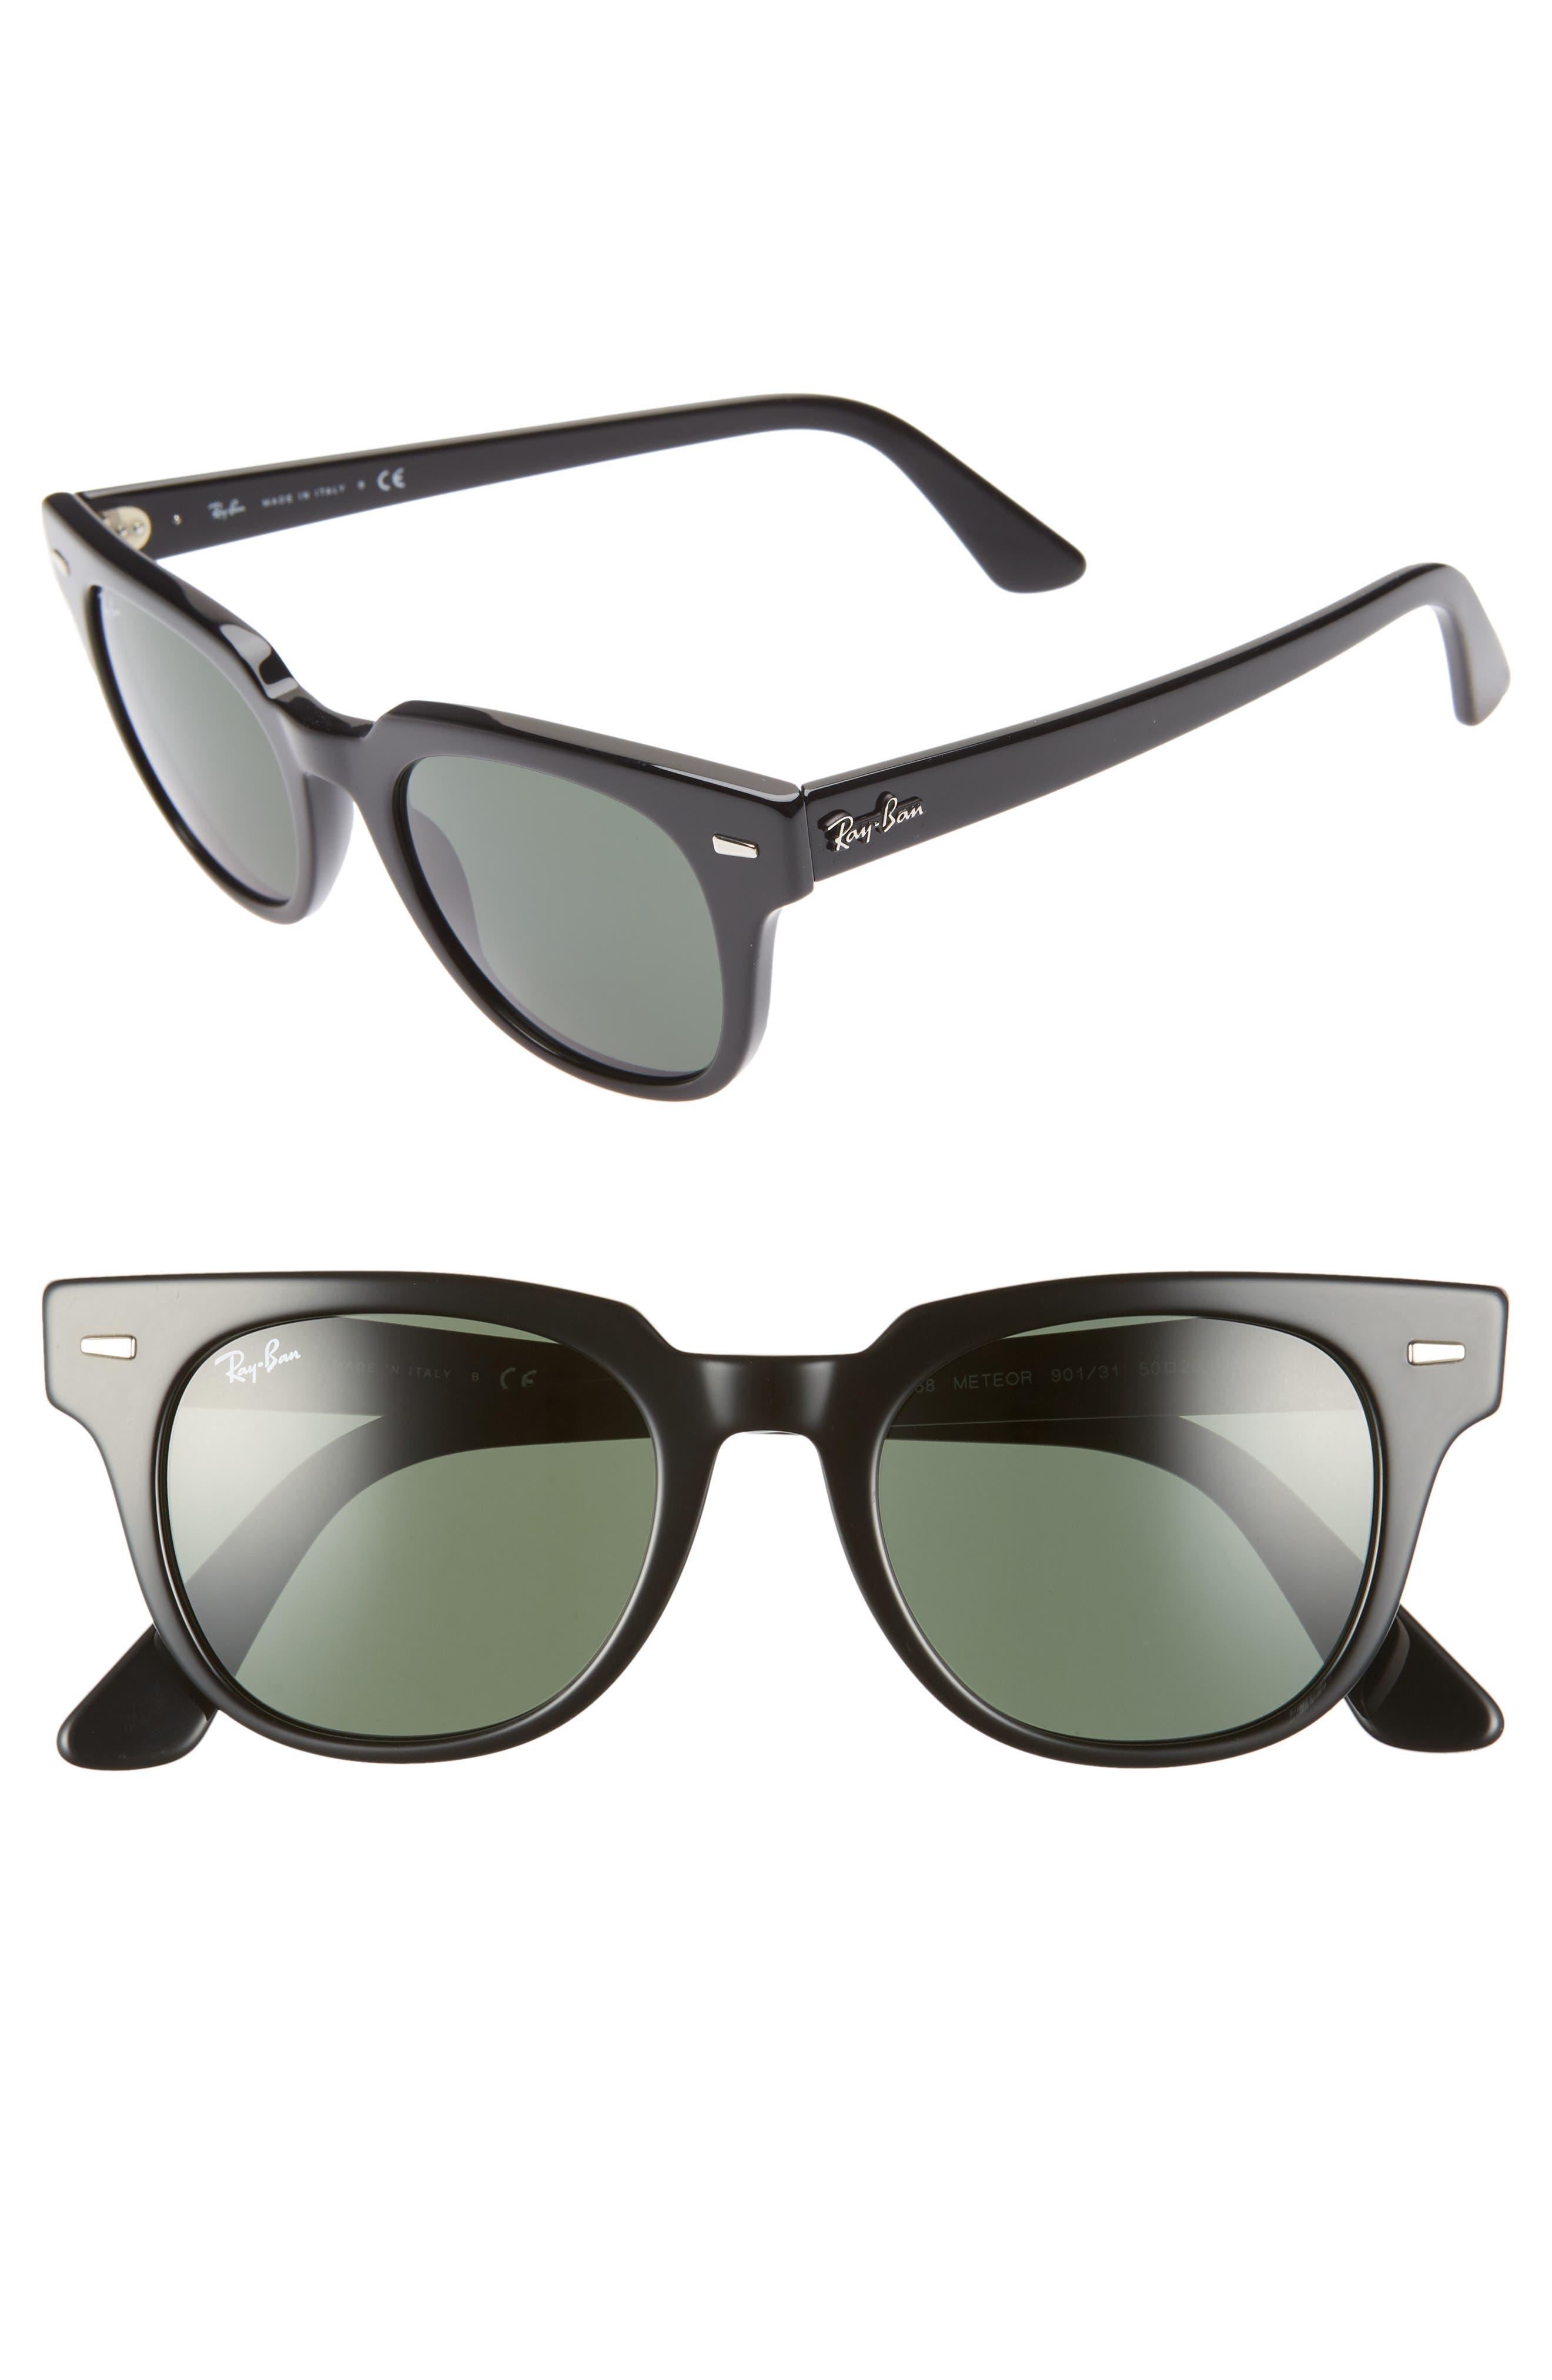 RAY-BAN, Meteor 50mm Wayfarer Sunglasses, Main thumbnail 1, color, BLACK SOLID